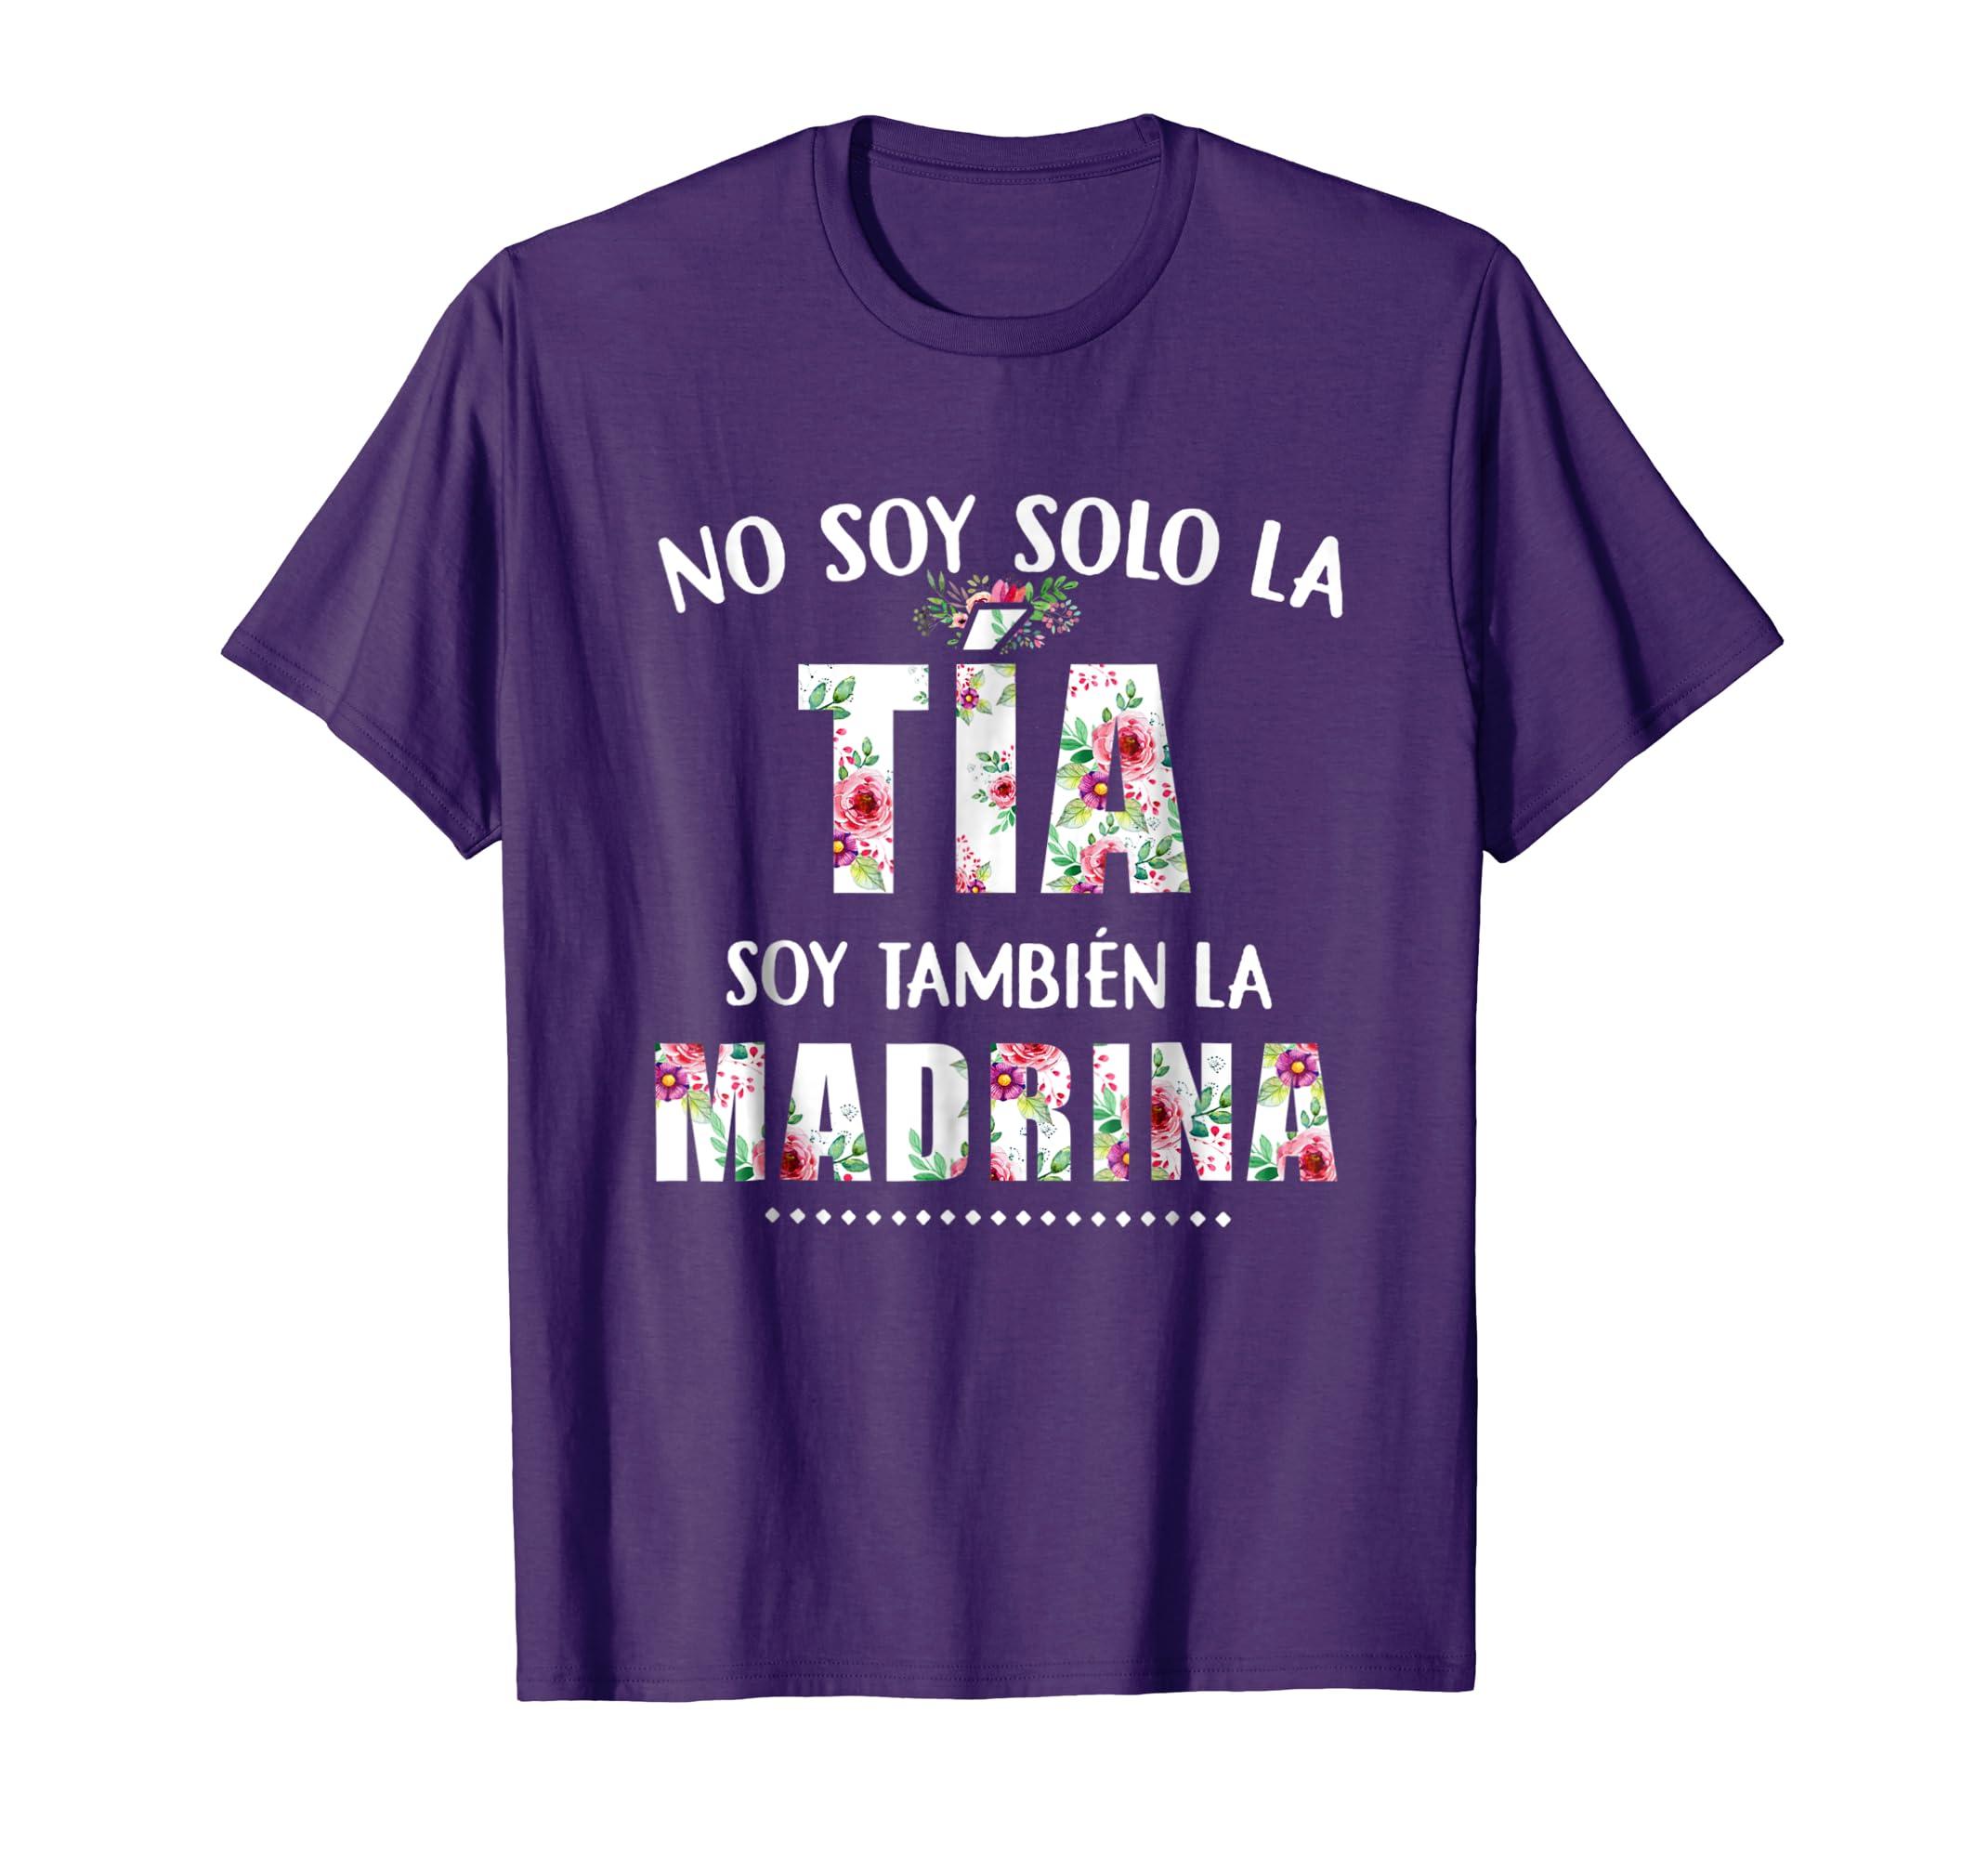 Amazoncom No Soy Solo La Tia Soy Tambien La Madrina Madre Shirt